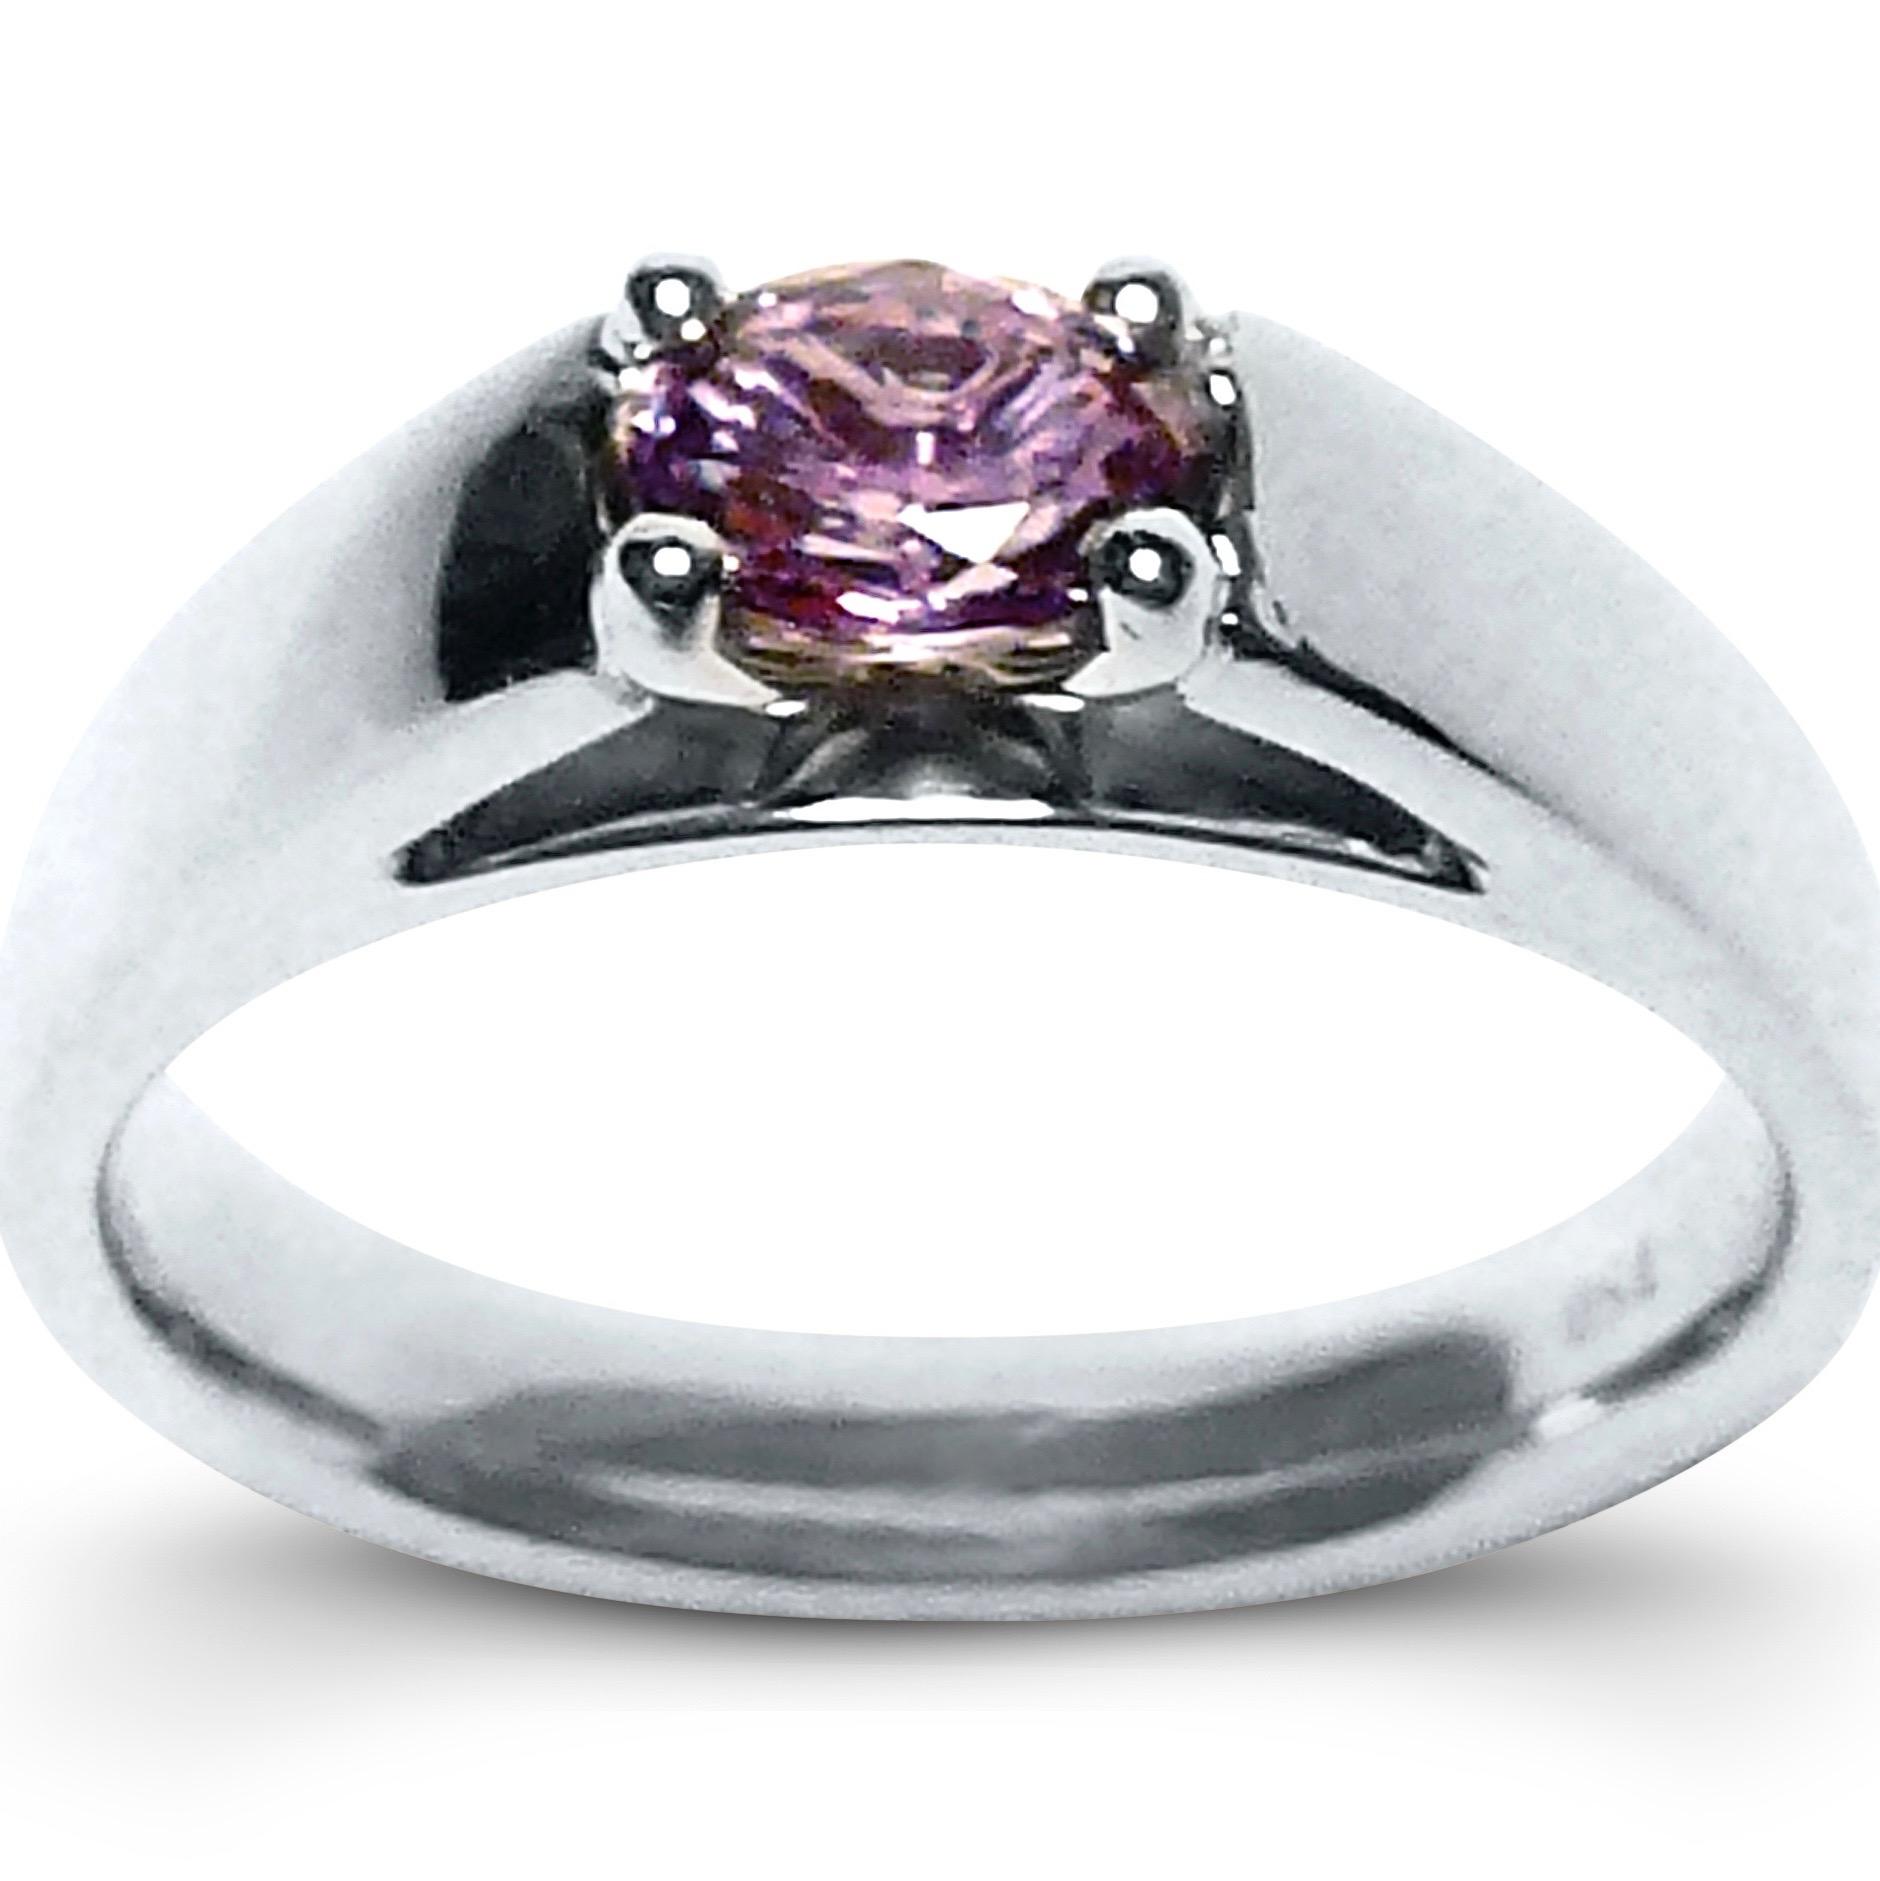 Natural colour change alexandrite engagement ring